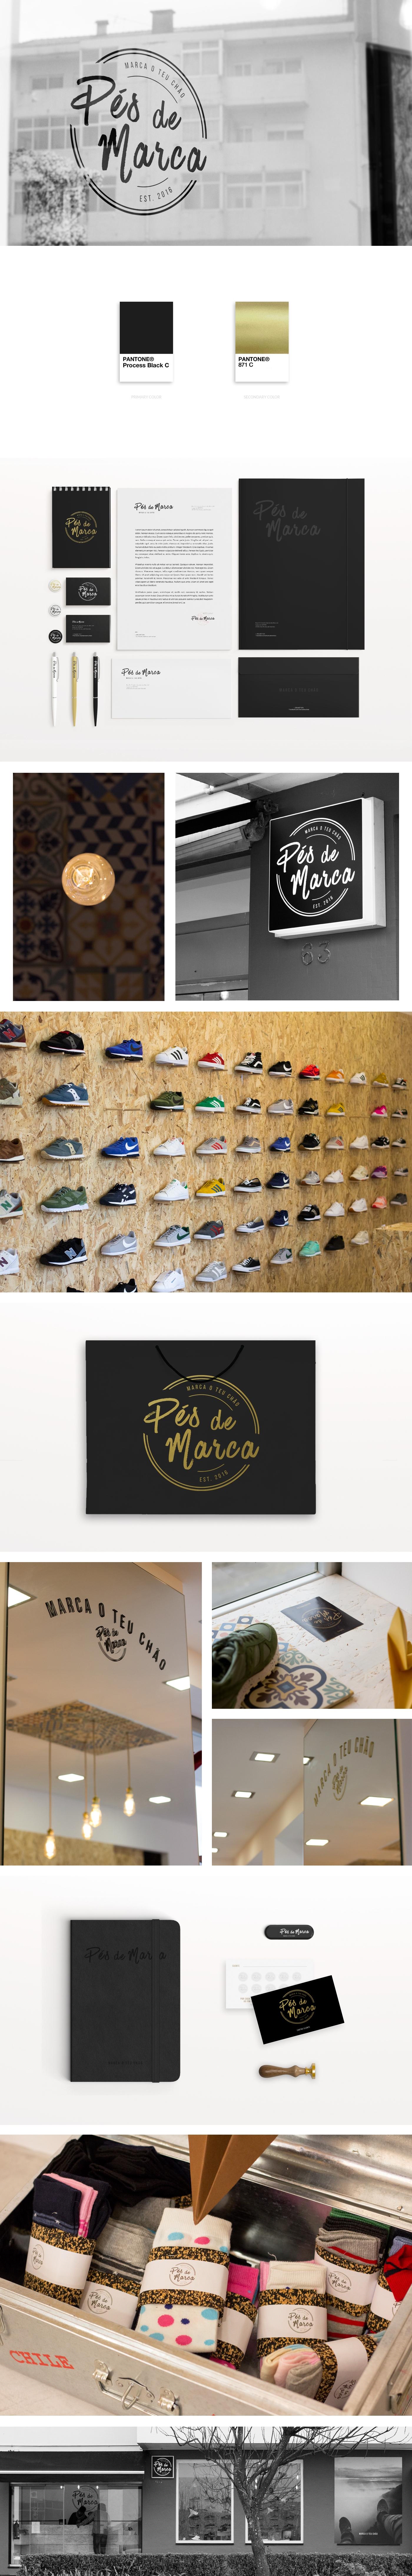 Sneaker Store in portugal